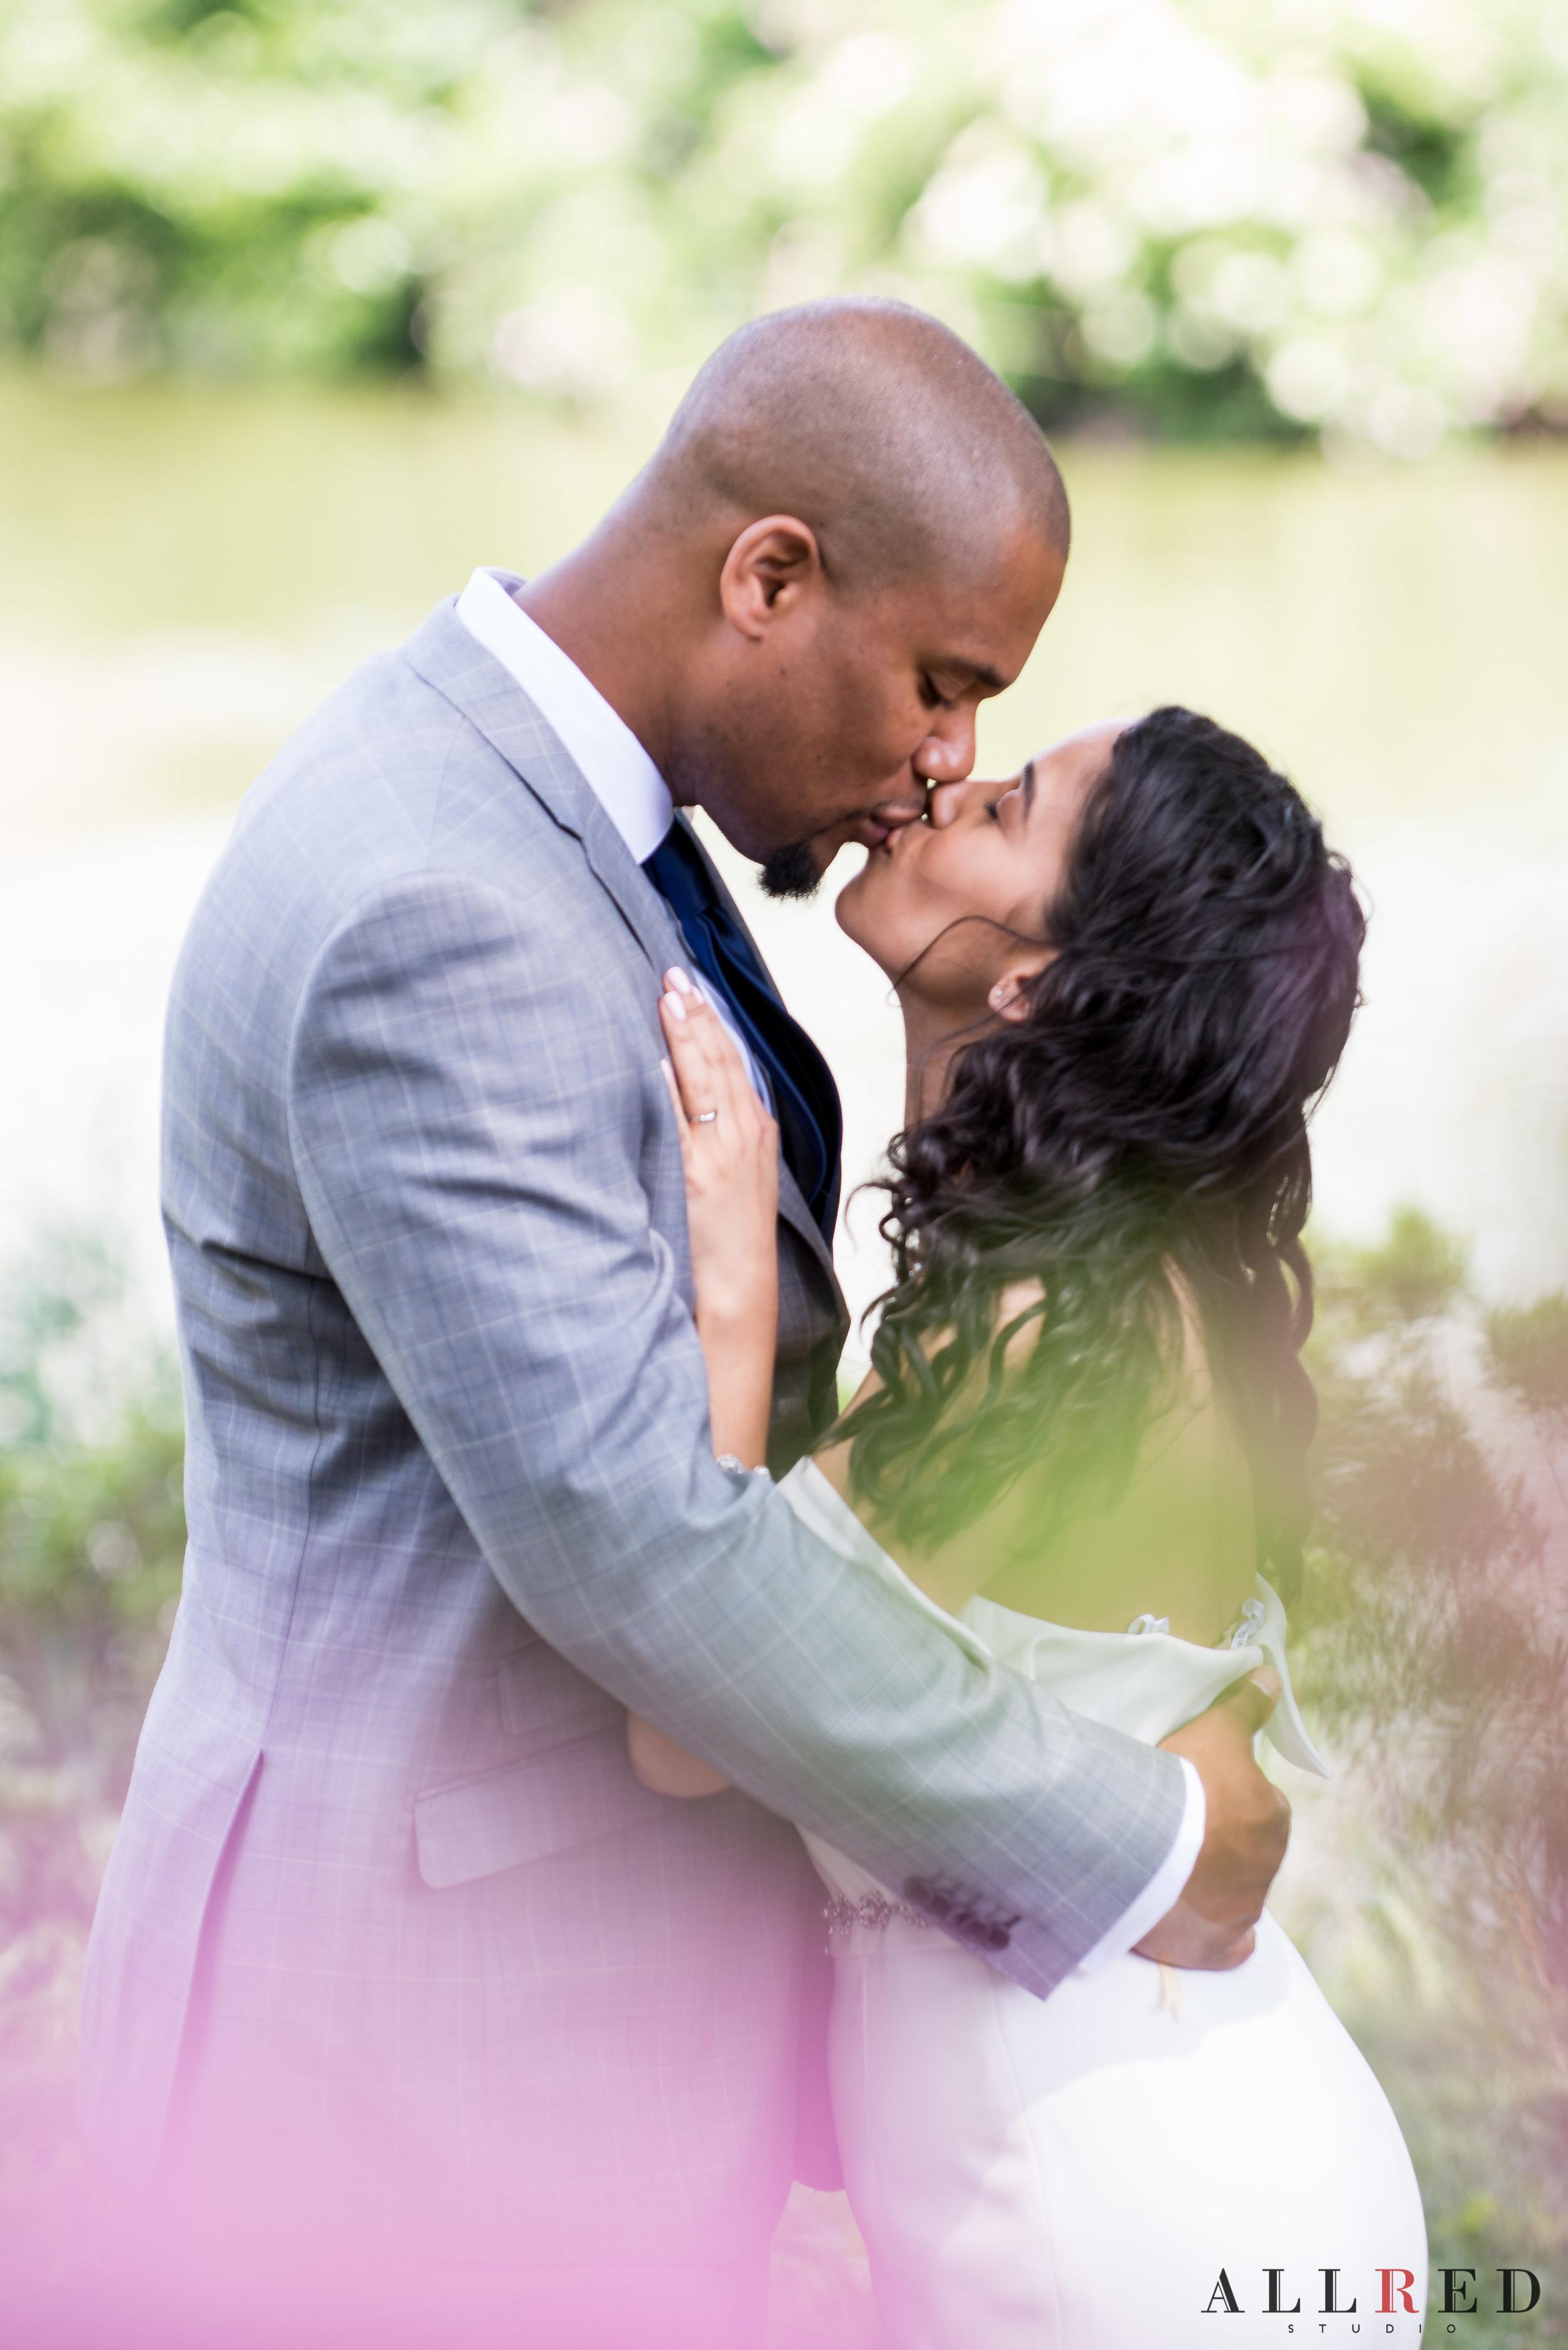 Wedding-central-park-allred-studio-new-york-photographer-new-jersey-hudson-valley-2420.jpg